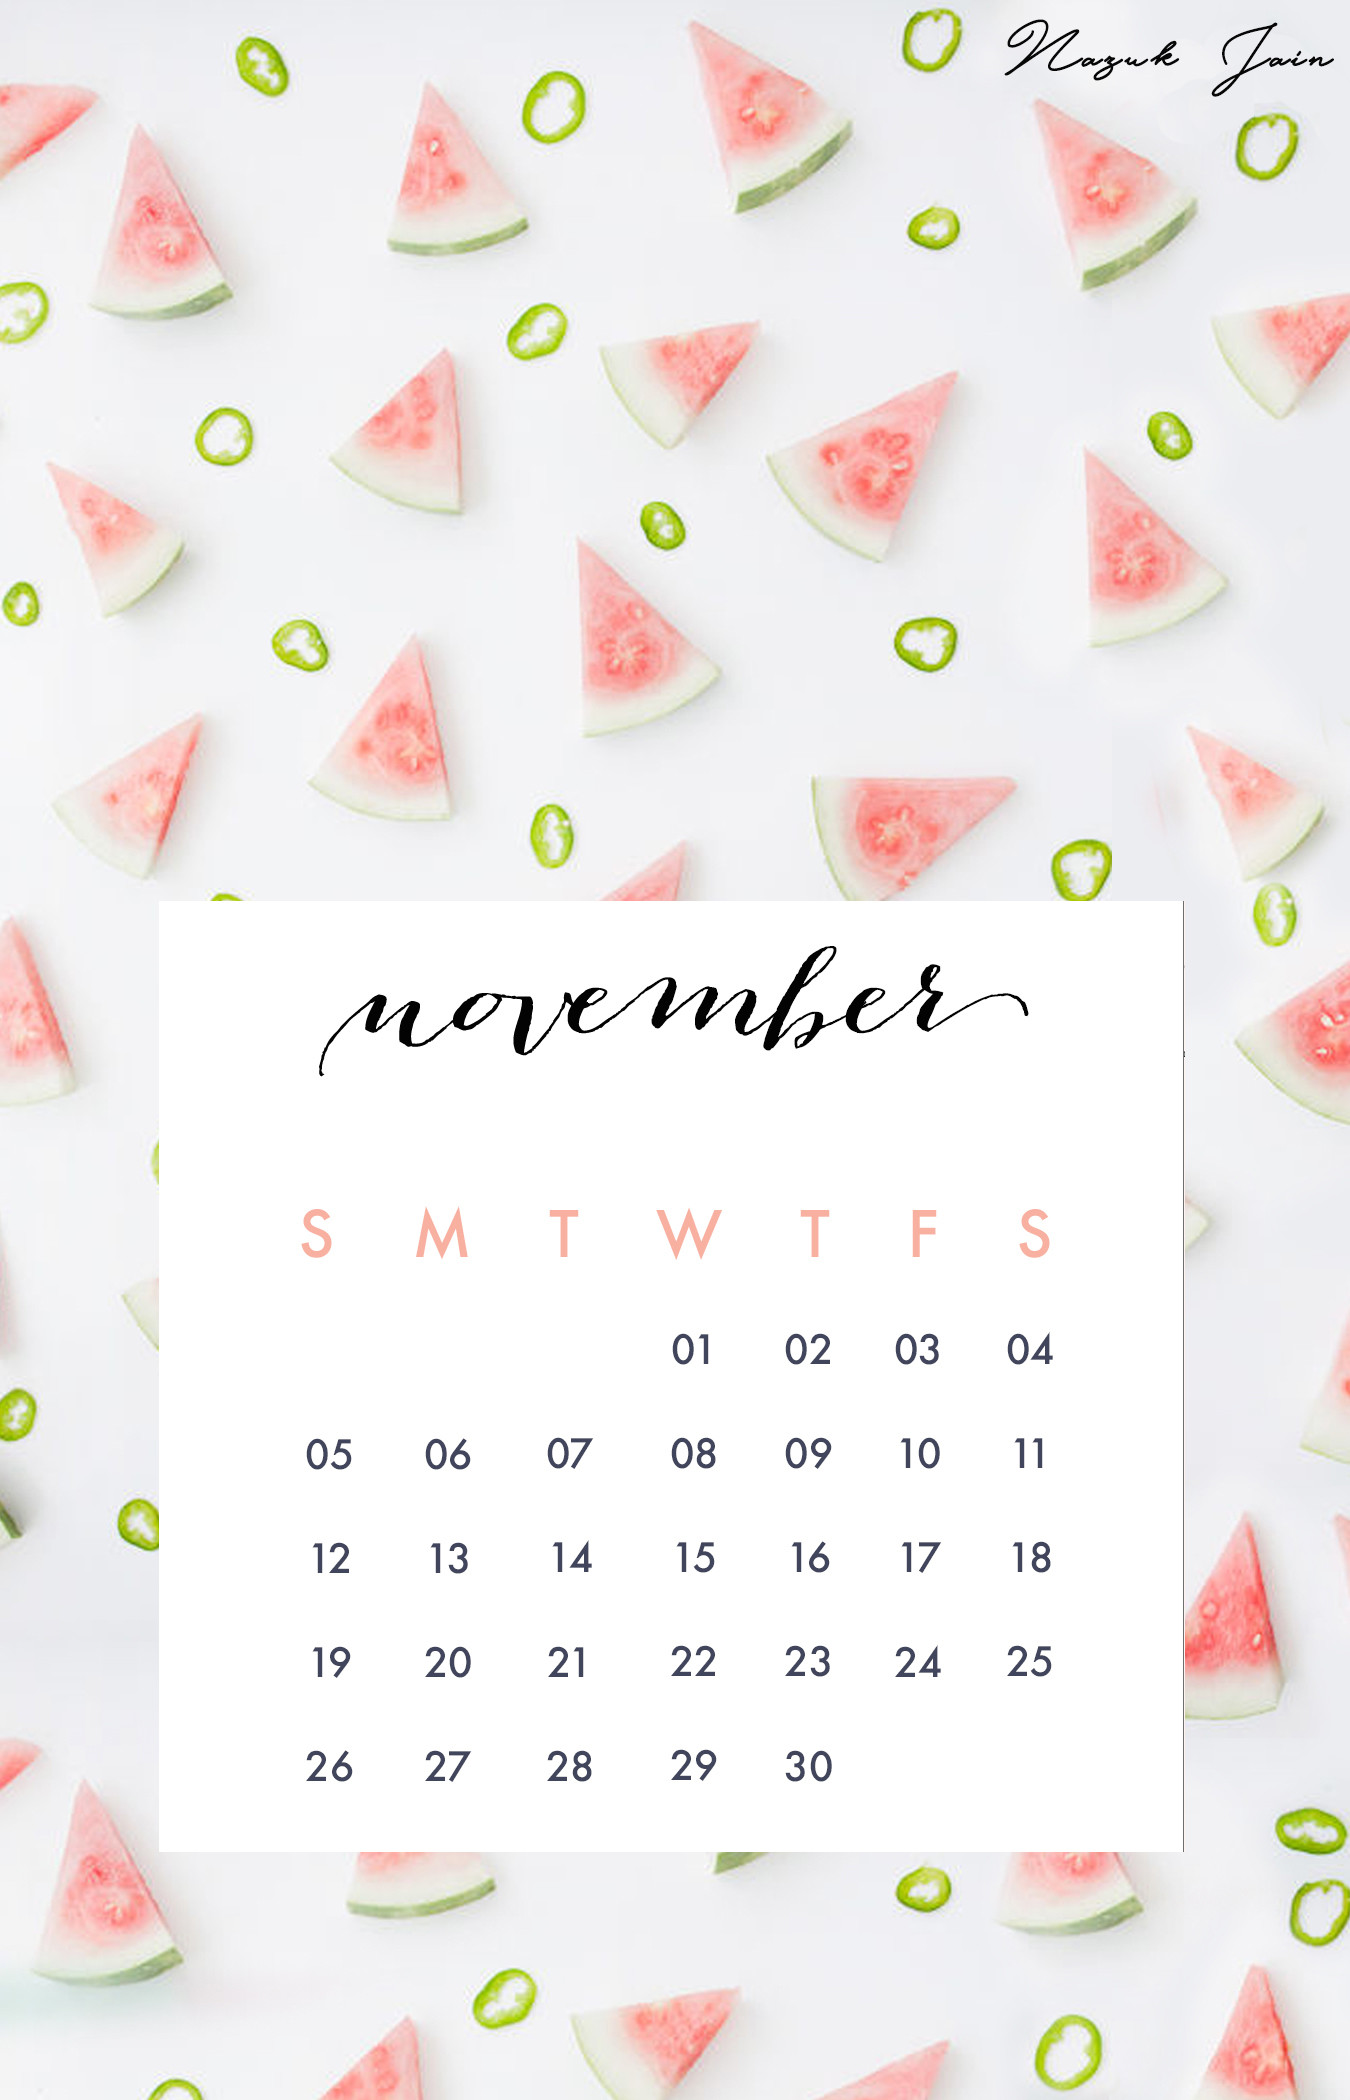 Calendar Wallpaper Quilling : Desktop wallpapers calendar may ·①